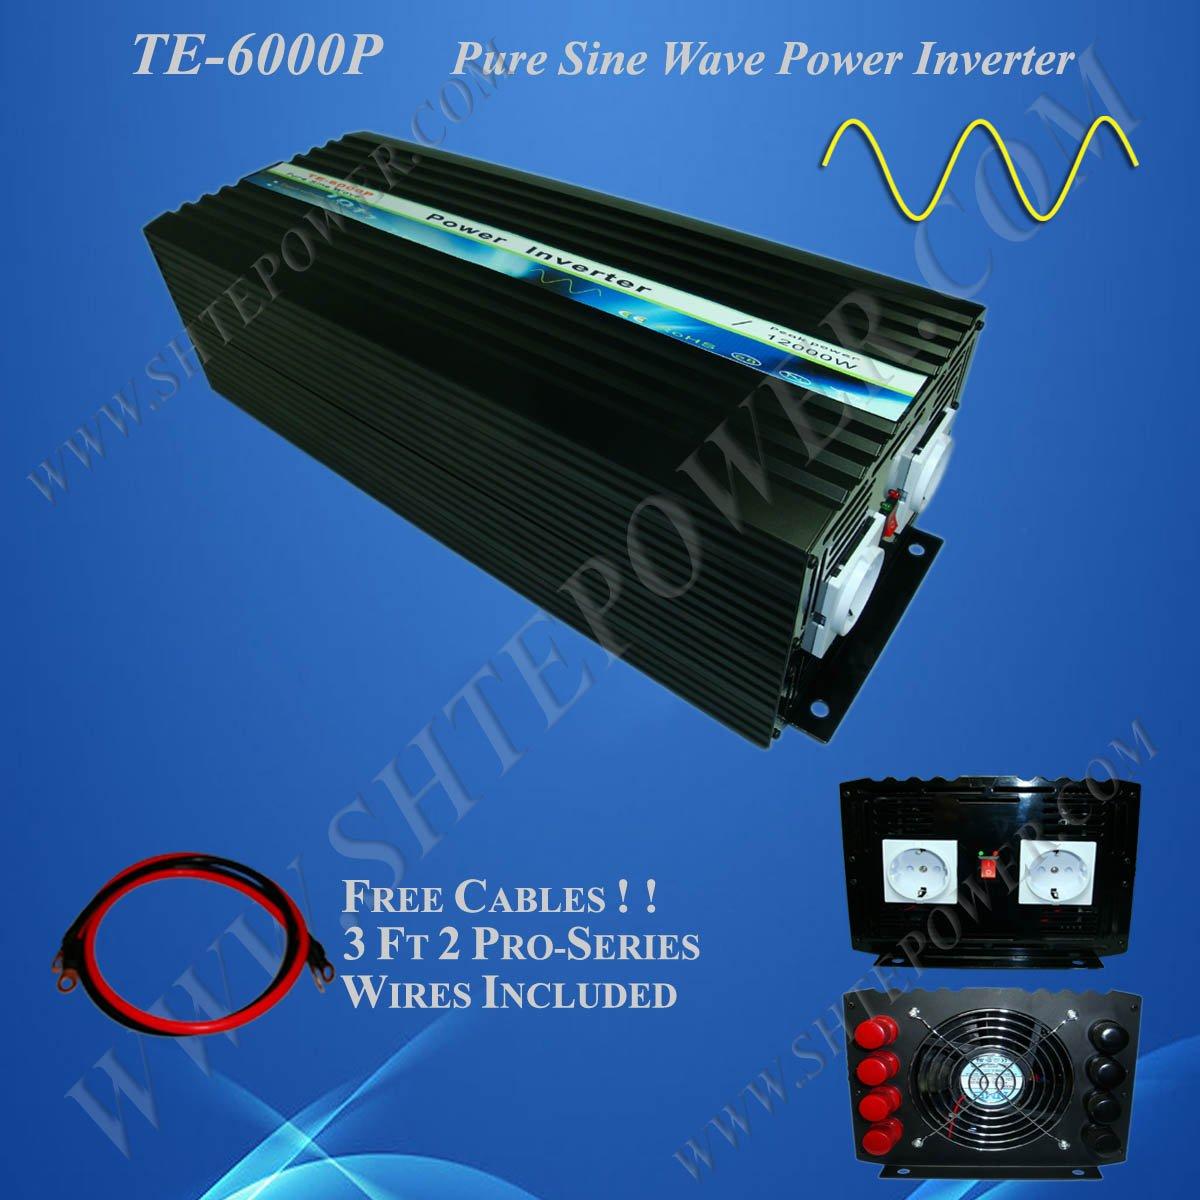 Power inverter DC 12v to AC 230v, 6000w pure sine wave power inverter